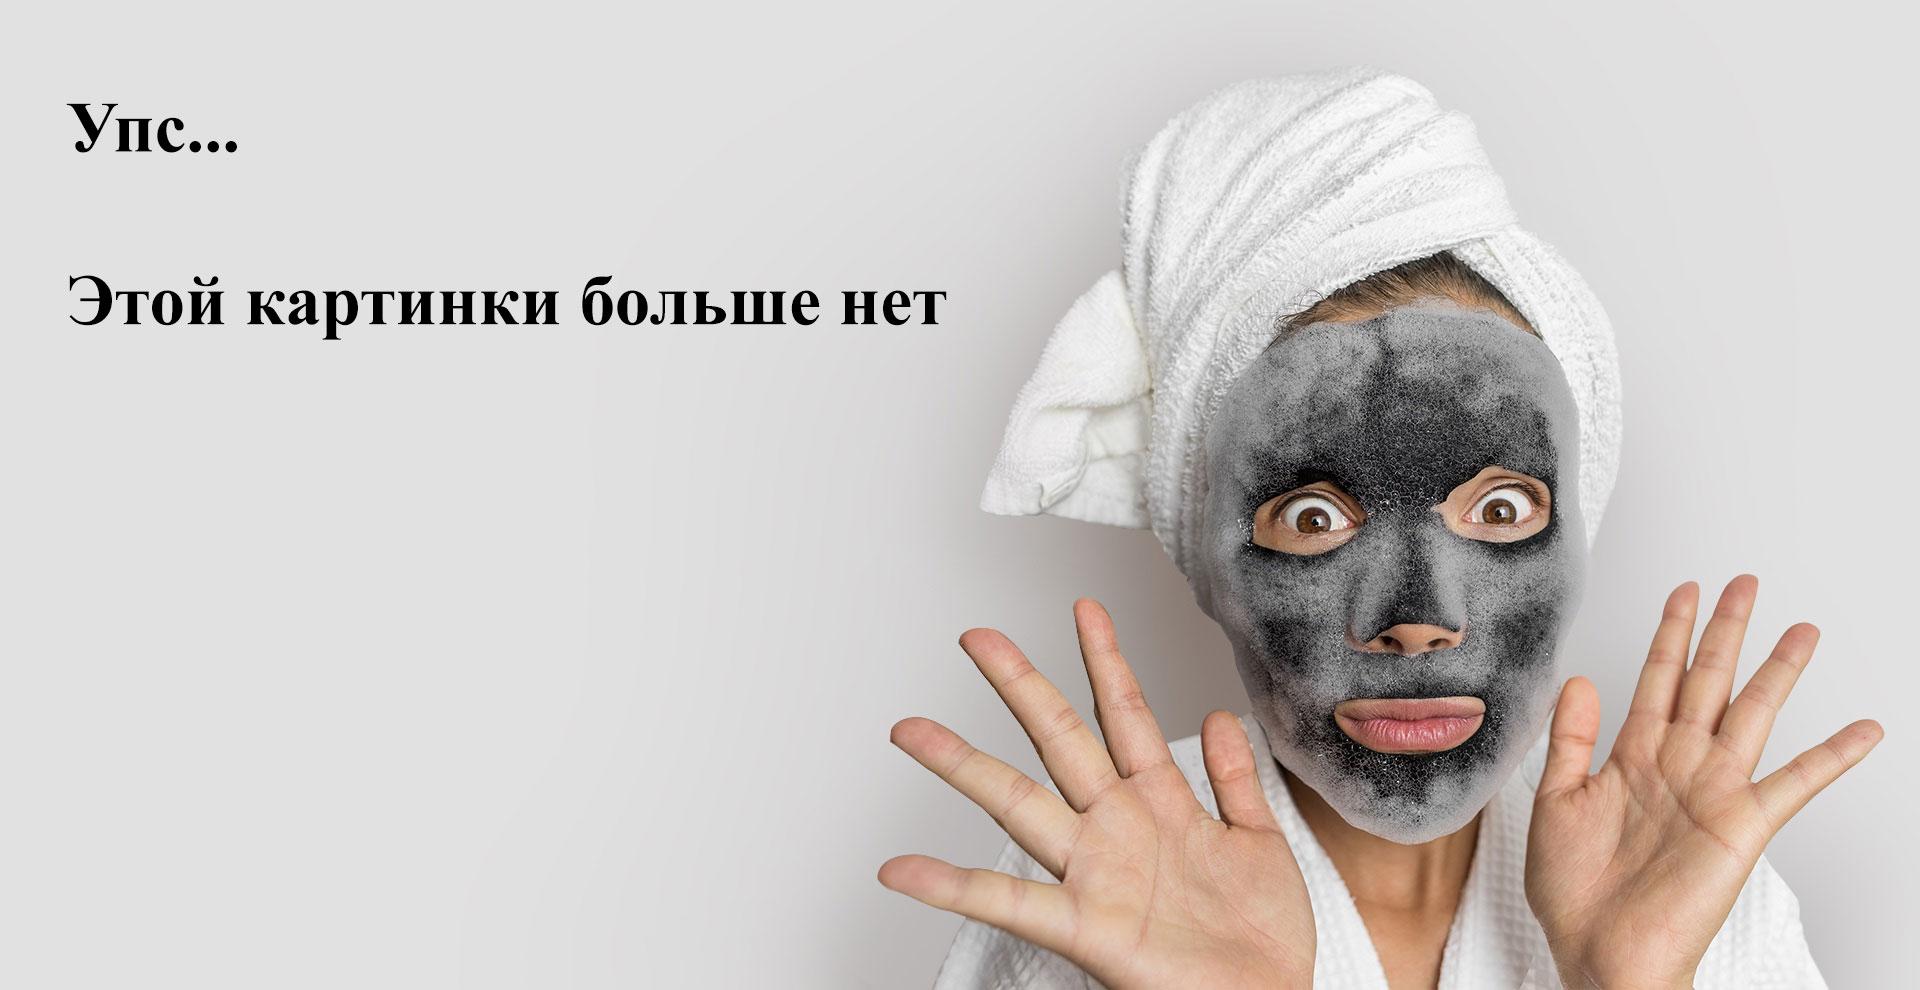 Siberina, Зубная паста «Угольная», 50 мл